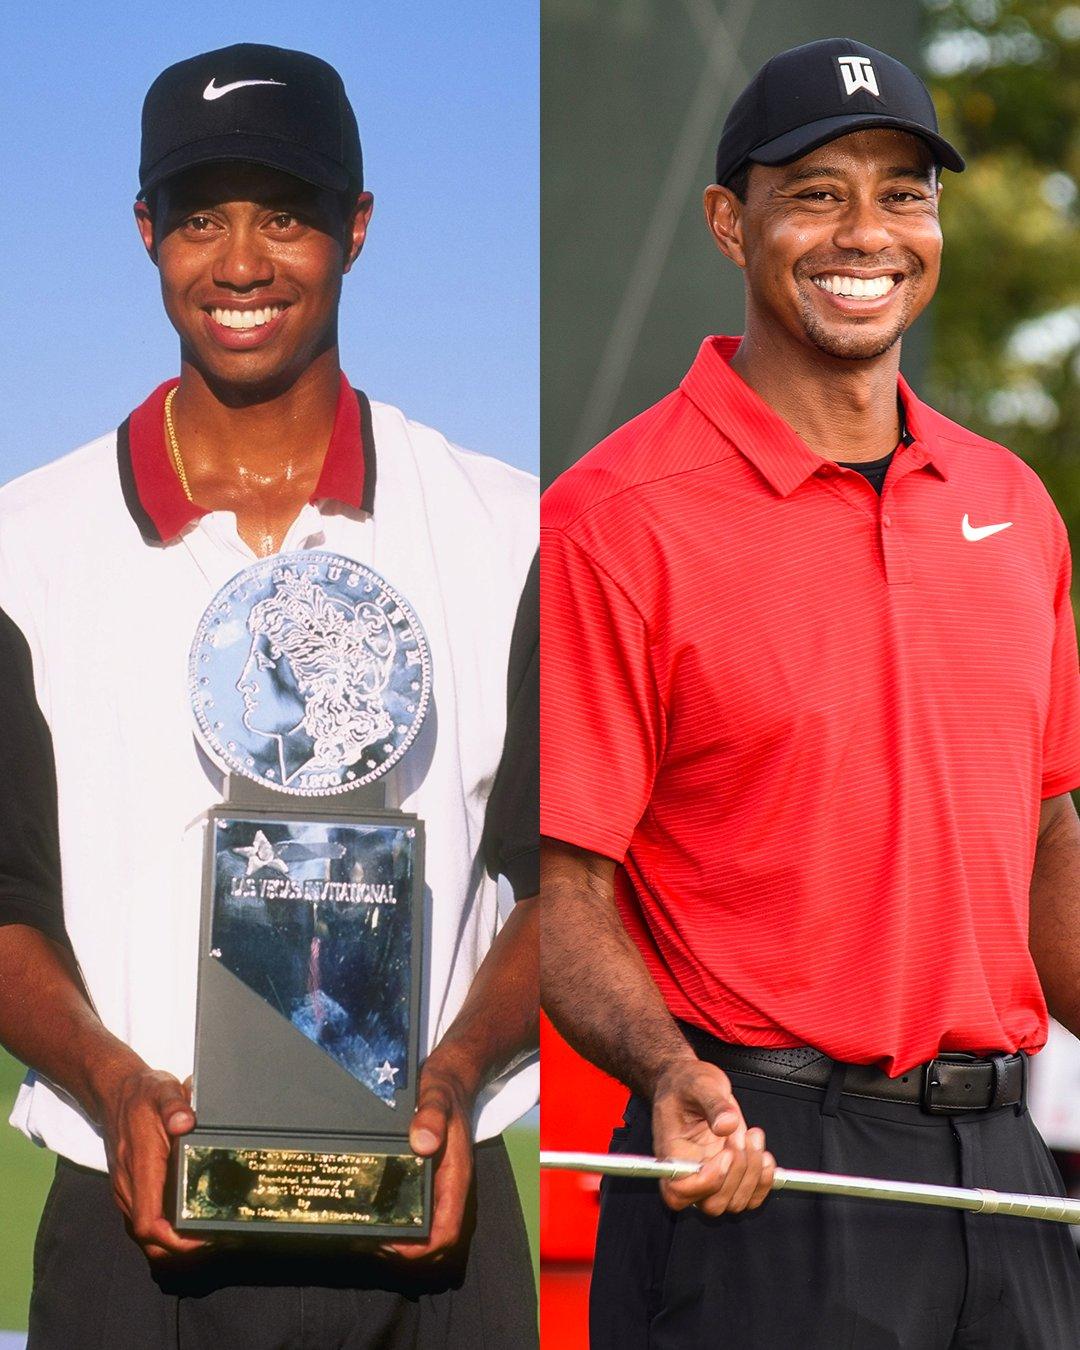 First professional Tiger win vs. 80th professional Tiger win. https://t.co/qTRkkBgiFf